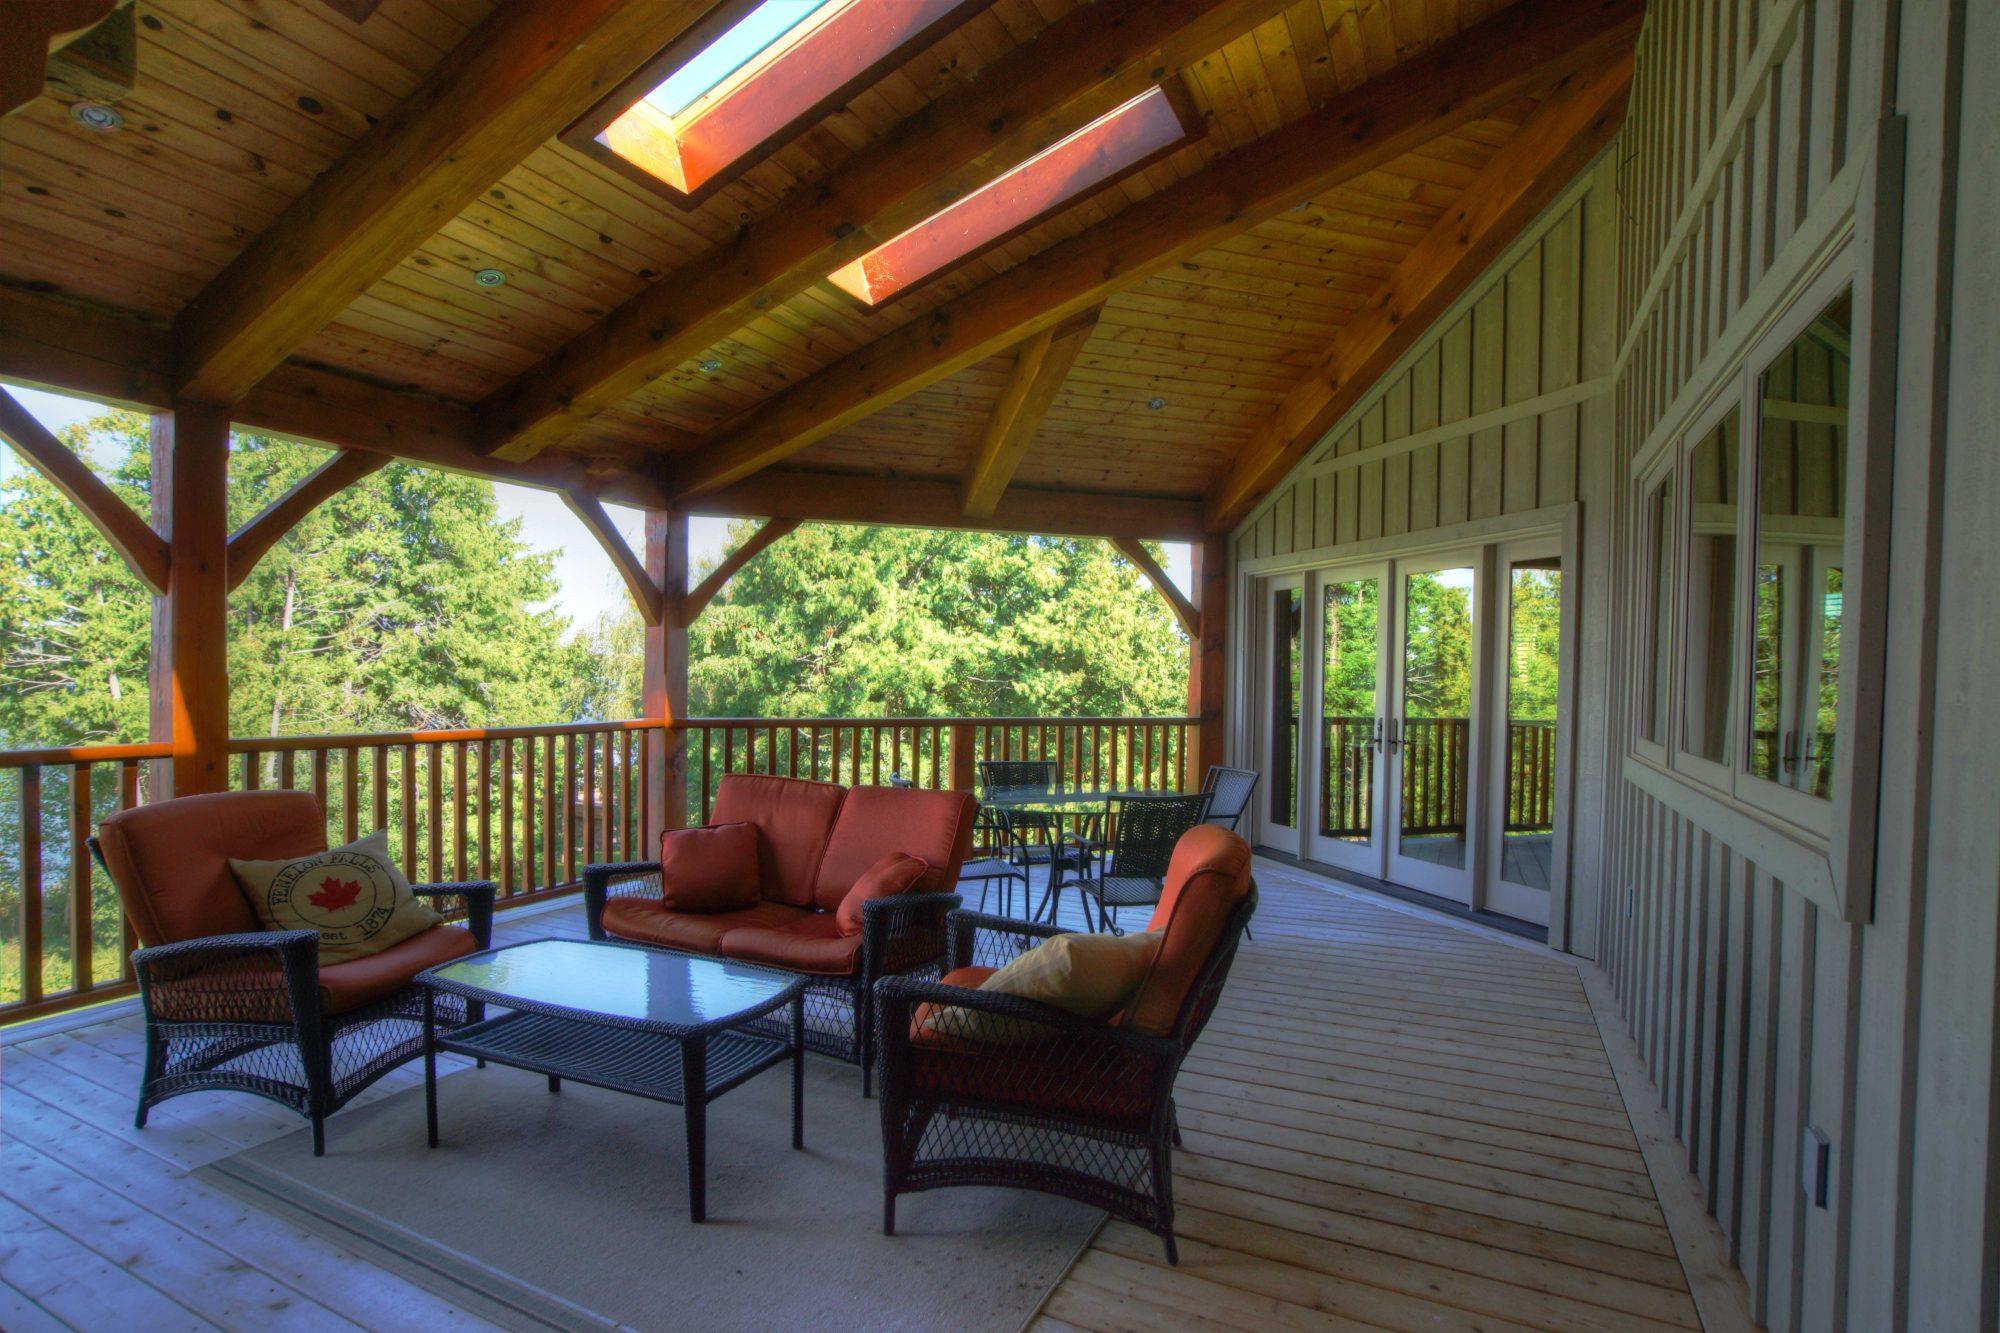 kawartha-lakes-cottage-for-sale-35-elysian-fields-7